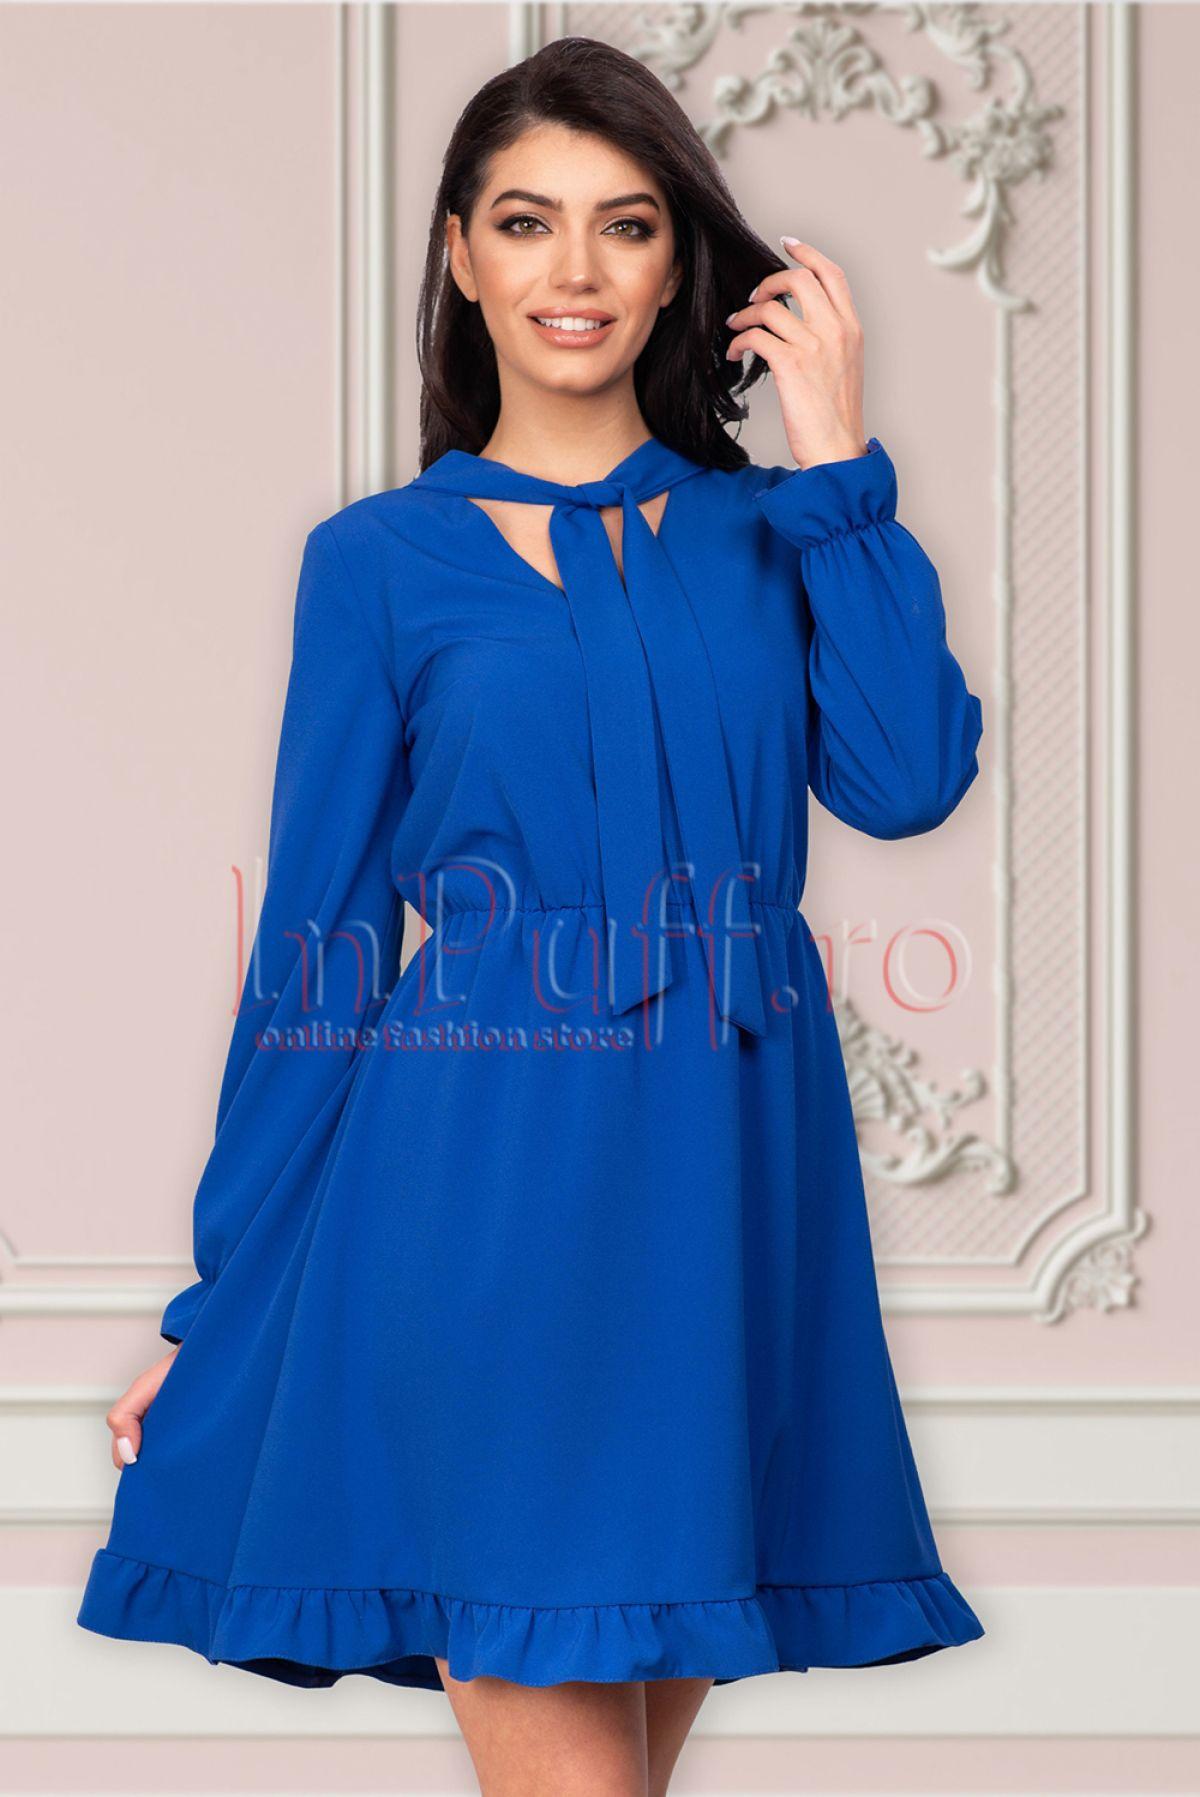 Rochie Moze albastra cu volanase si cret in talie Moze